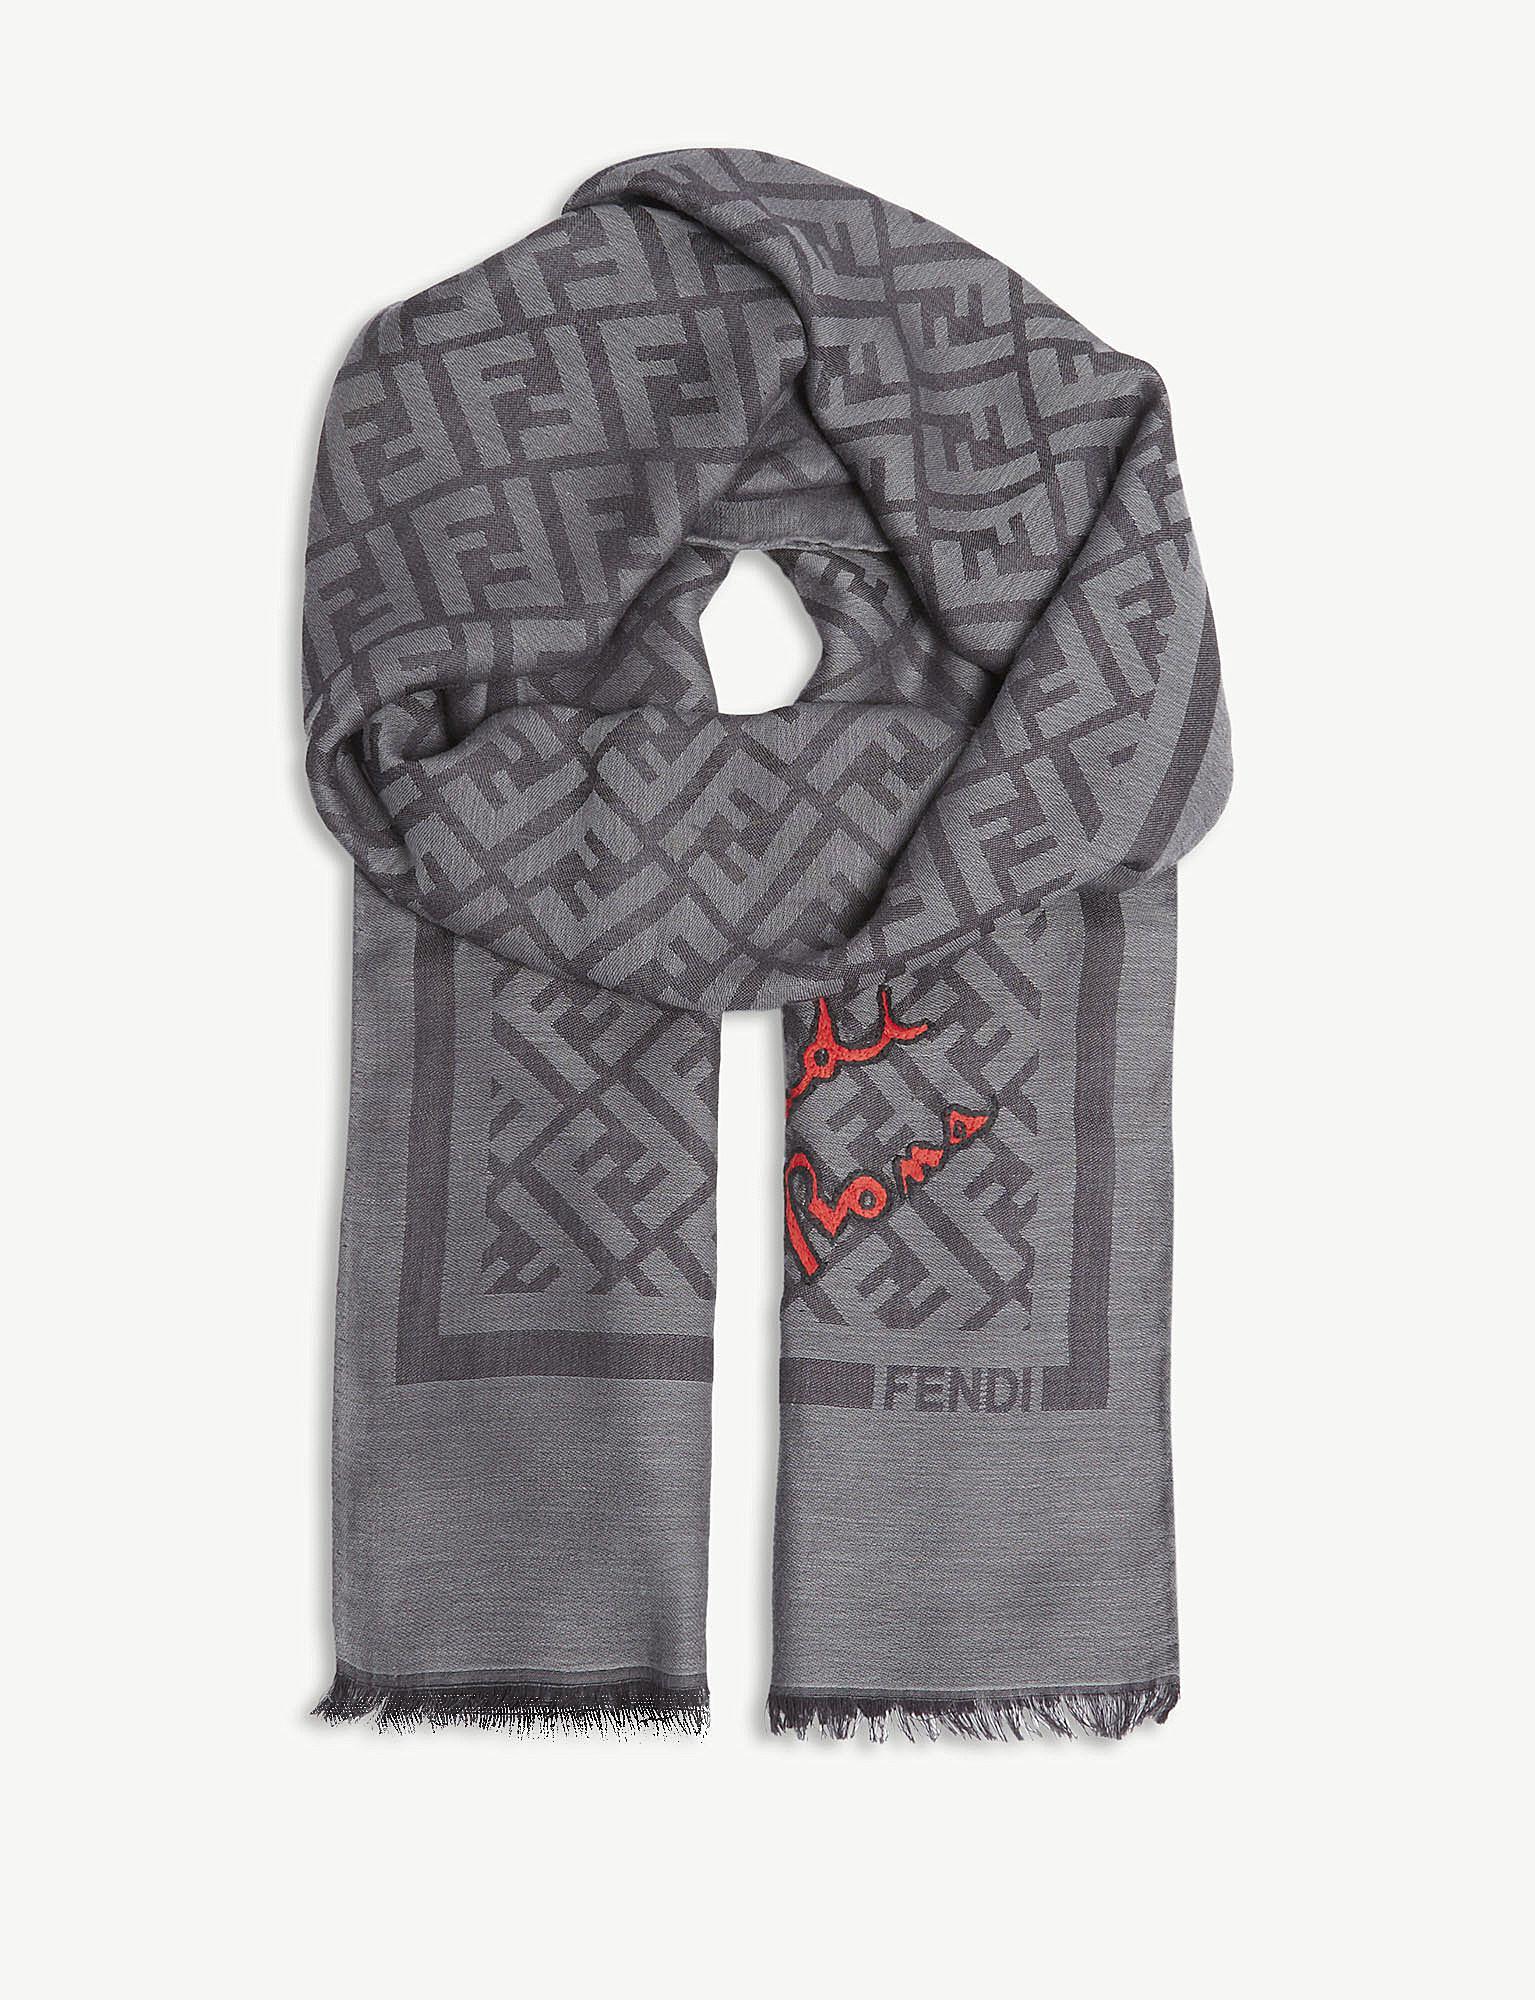 8336d3657ba1 ... denmark lyst fendi logo silk blend scarf in gray for men 0f1ae e55ac